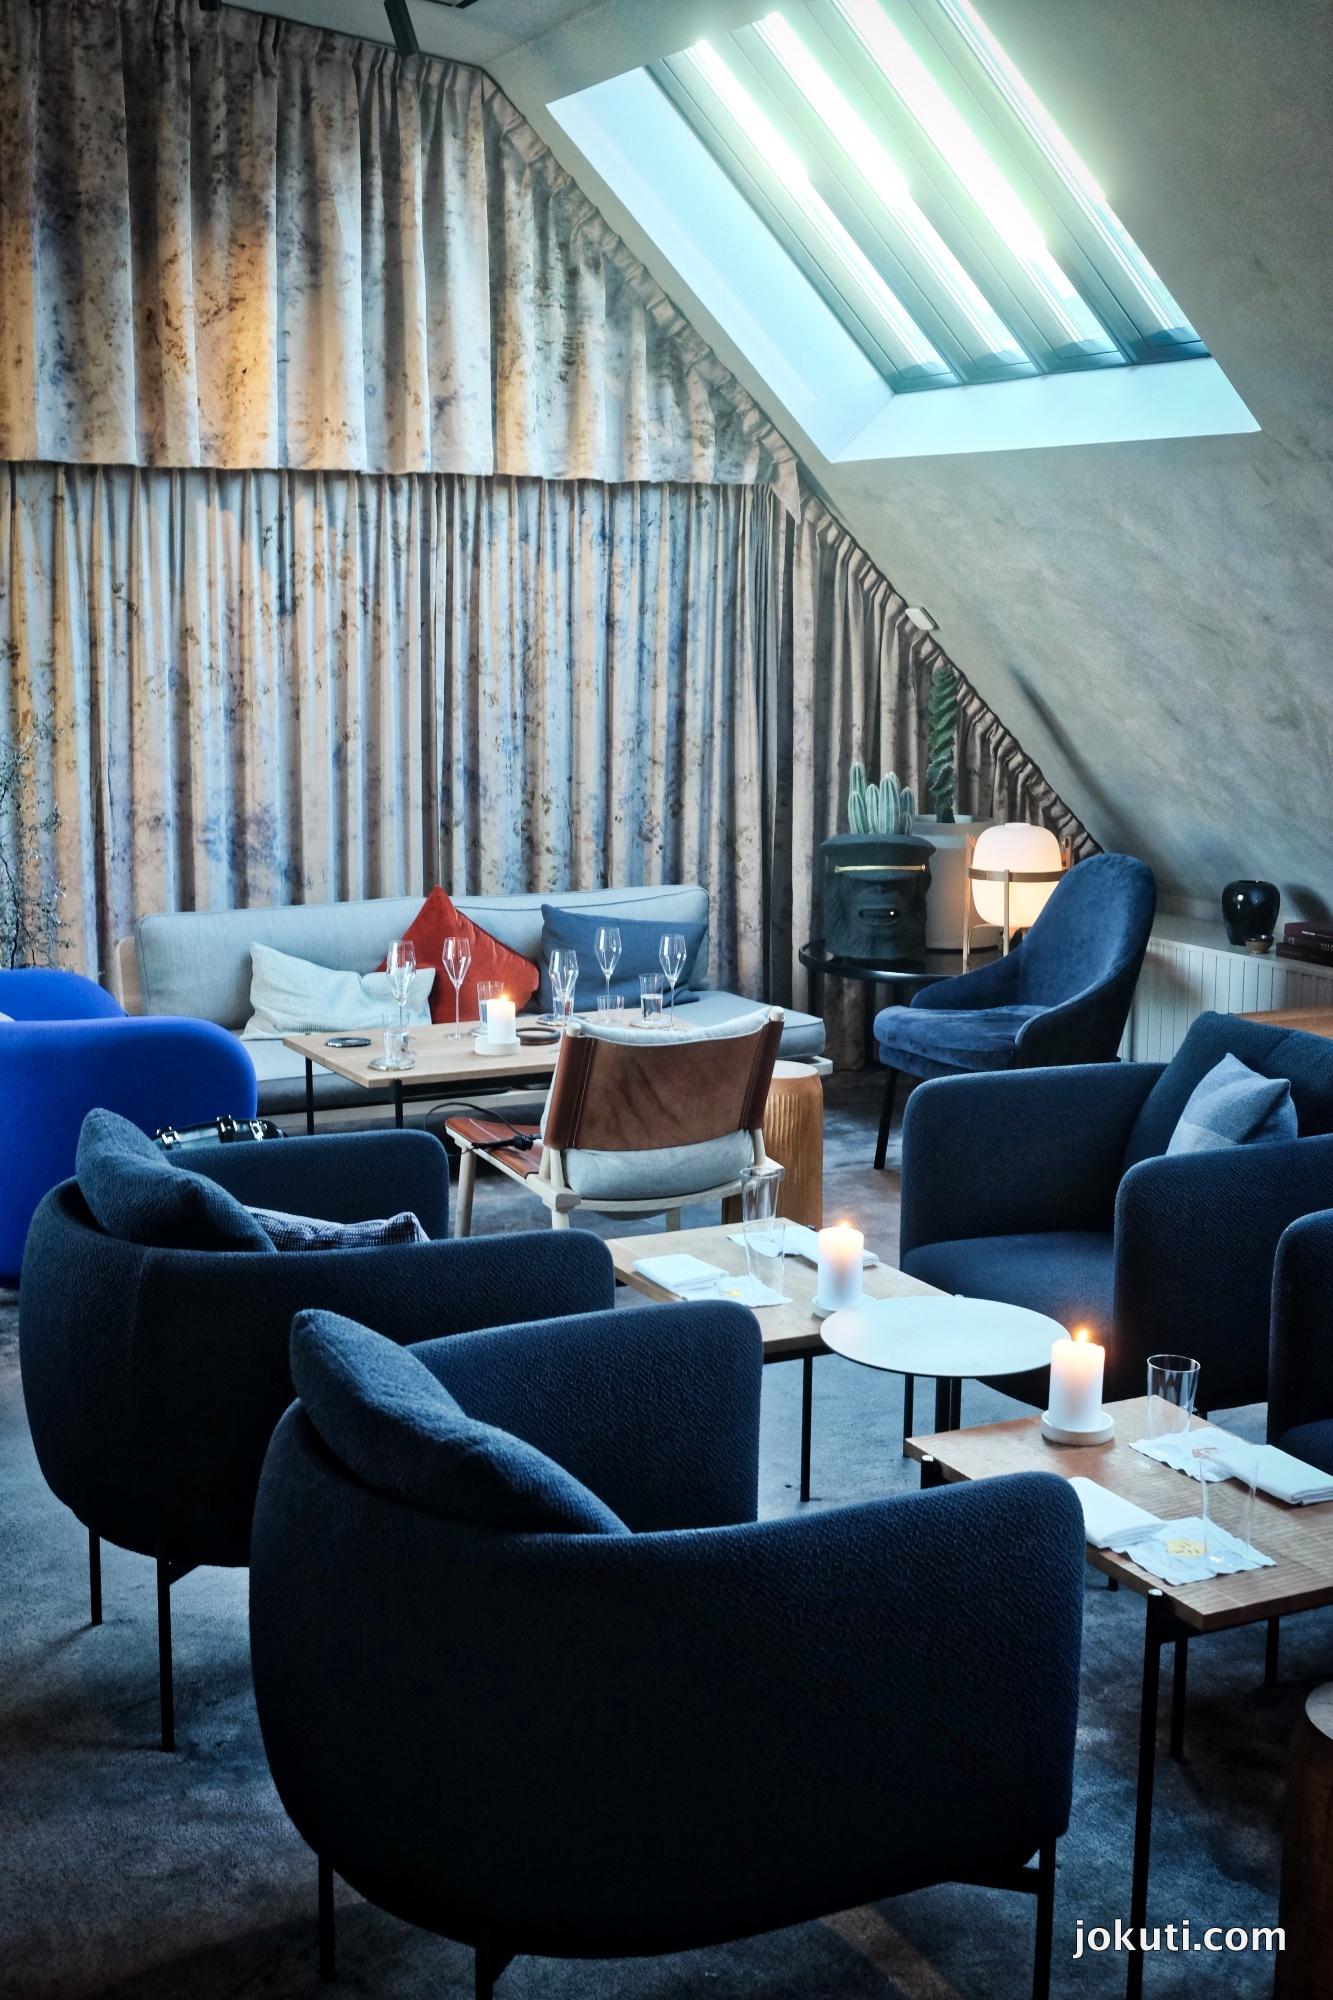 dscf5400_frantzen_stockholm_restaurant_michelin_stars_sweden_vilagevo_jokuti_l.jpg